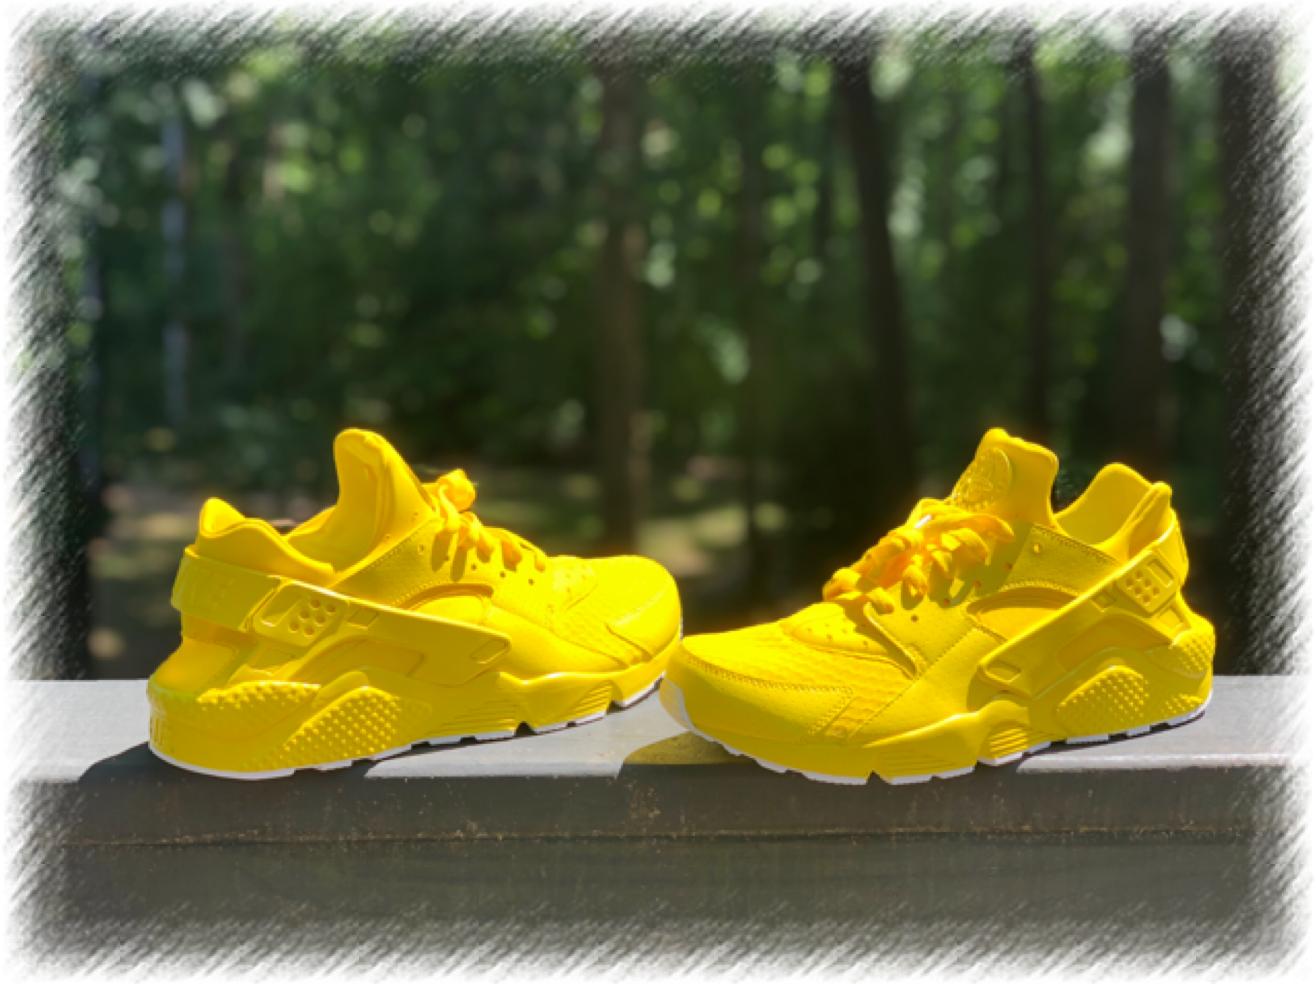 Sunshine Yellow Nike Huaraches custom available at